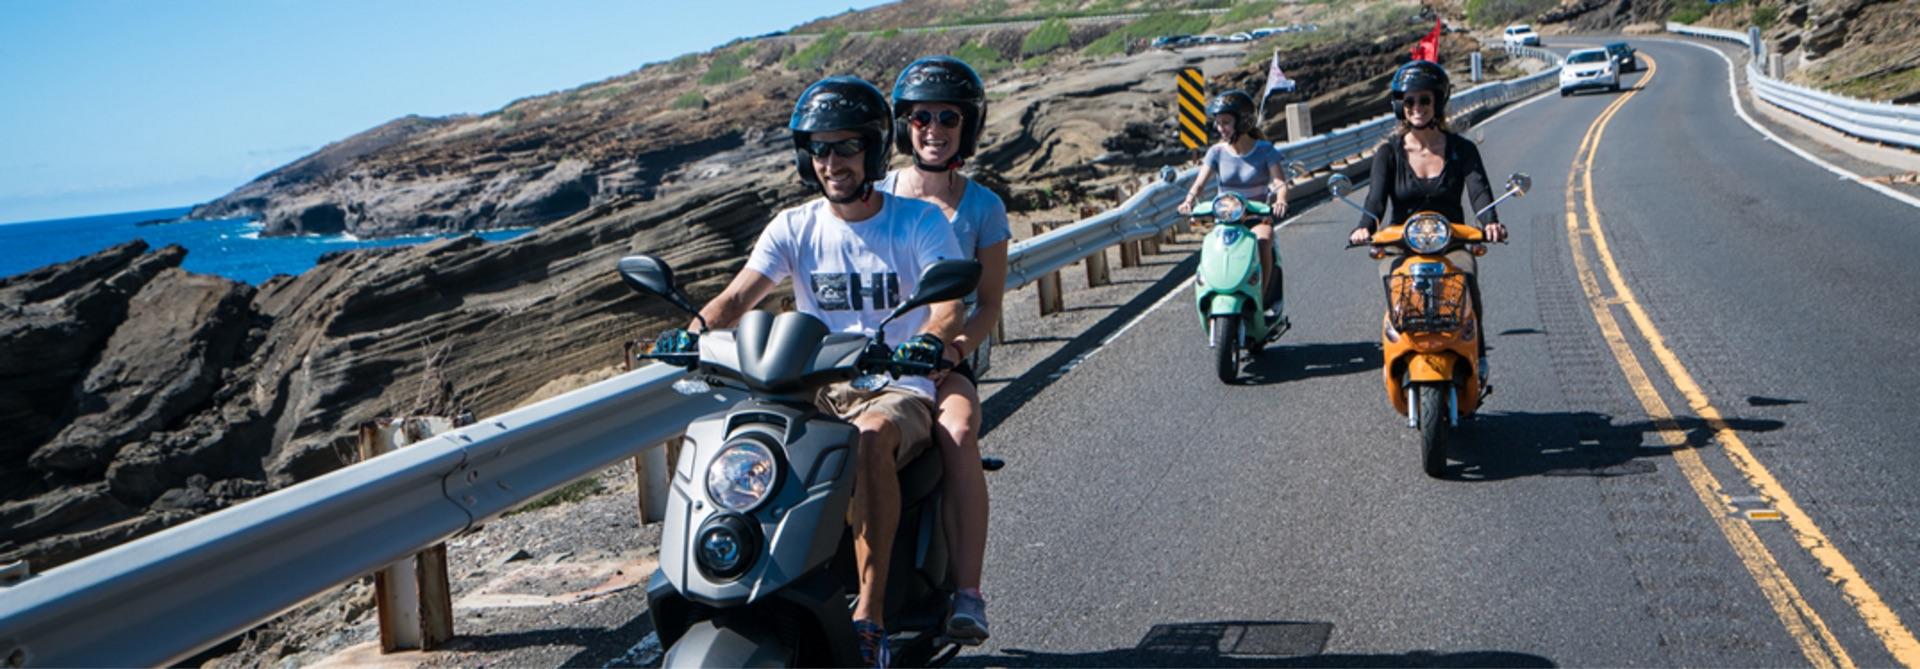 scooter-header